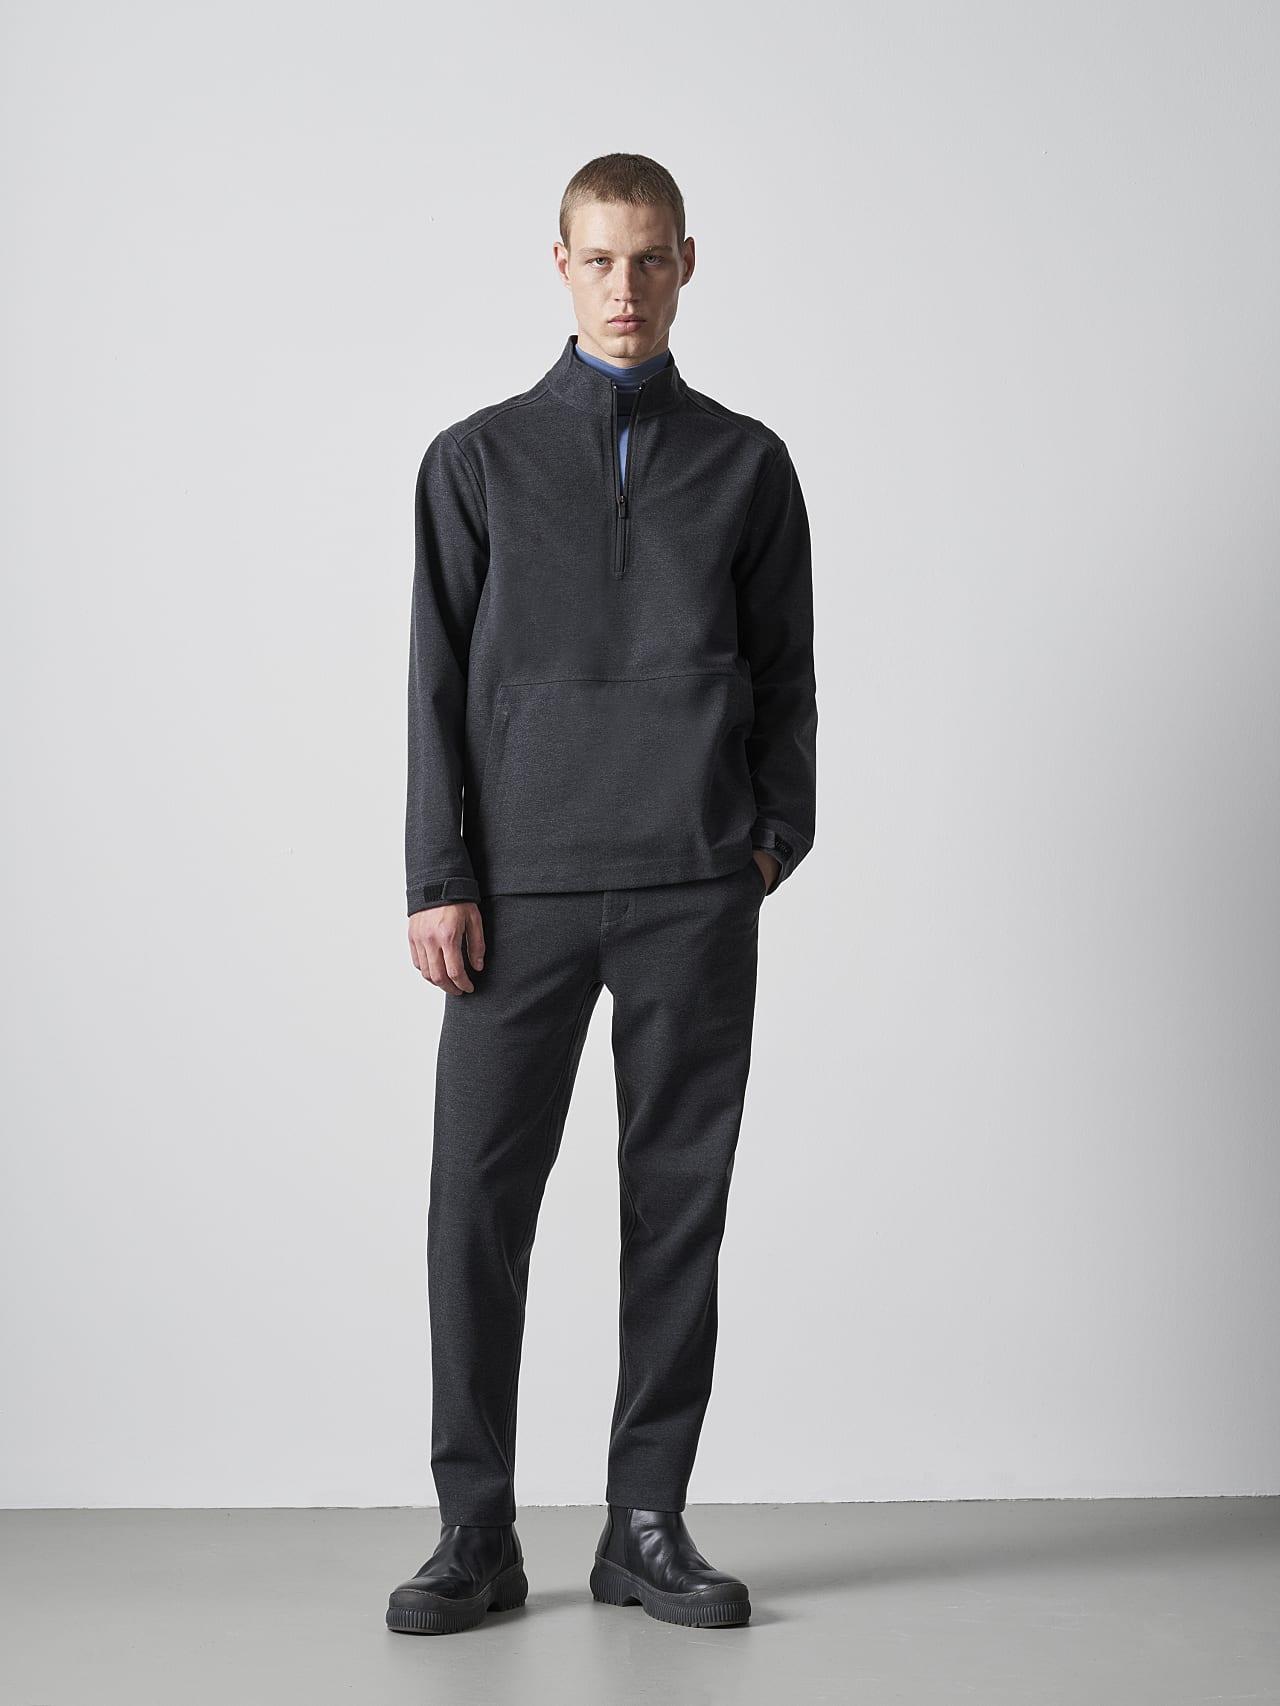 SROTO V1.Y5.02 Waterproof Half-Zip Sweatshirt dark grey / anthracite Front Alpha Tauri